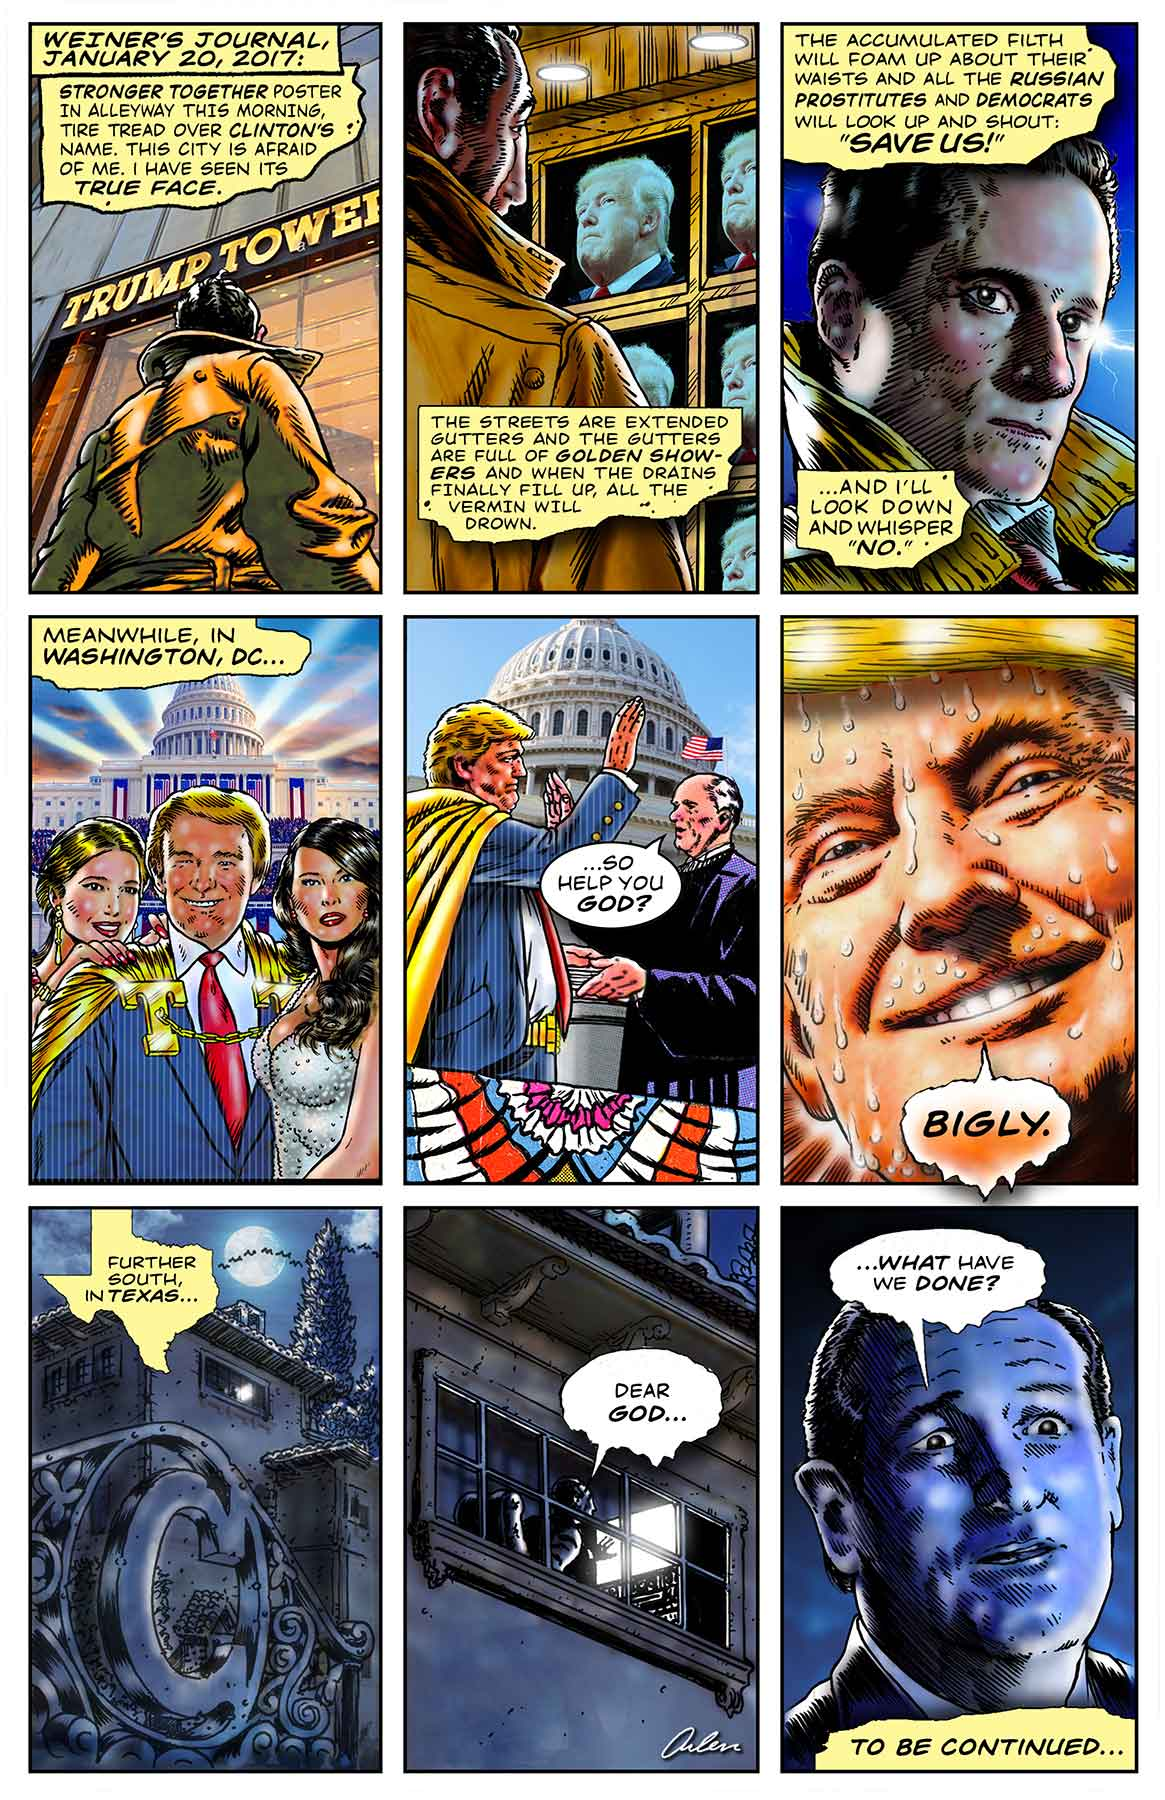 Arlen Schumer / Trump Comic